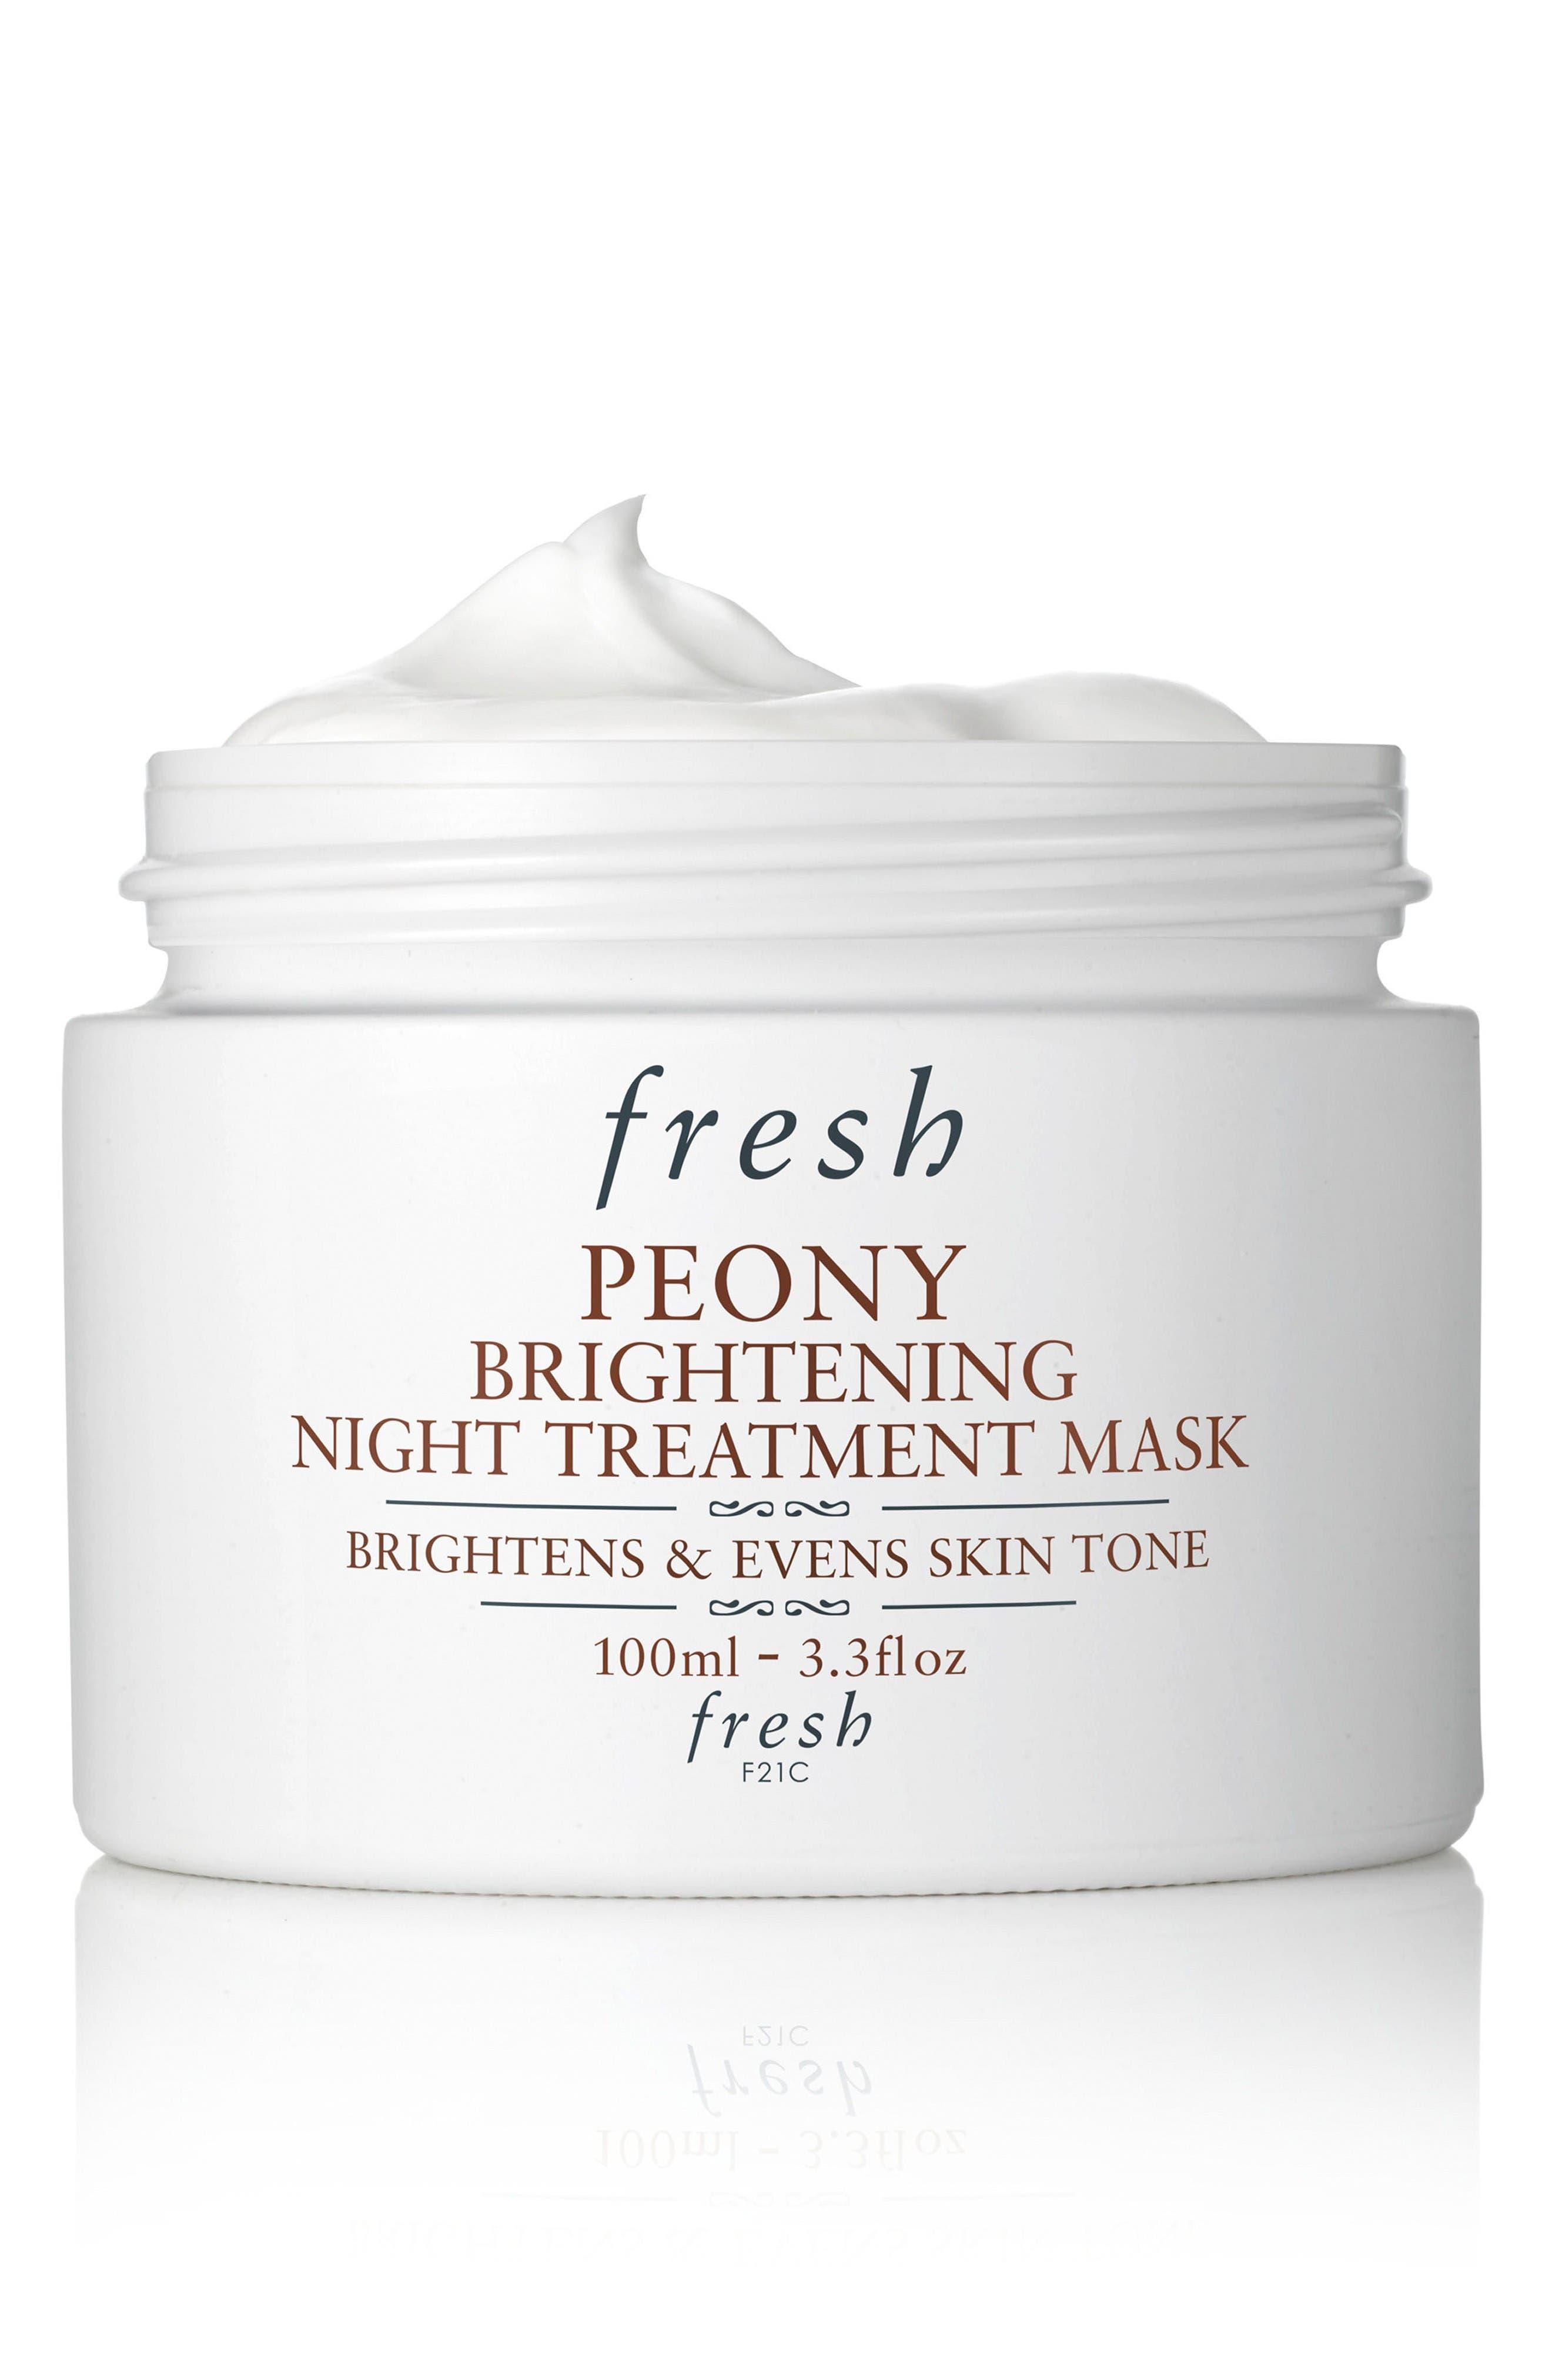 Fresh® Peony Brightening Night Treatment Mask